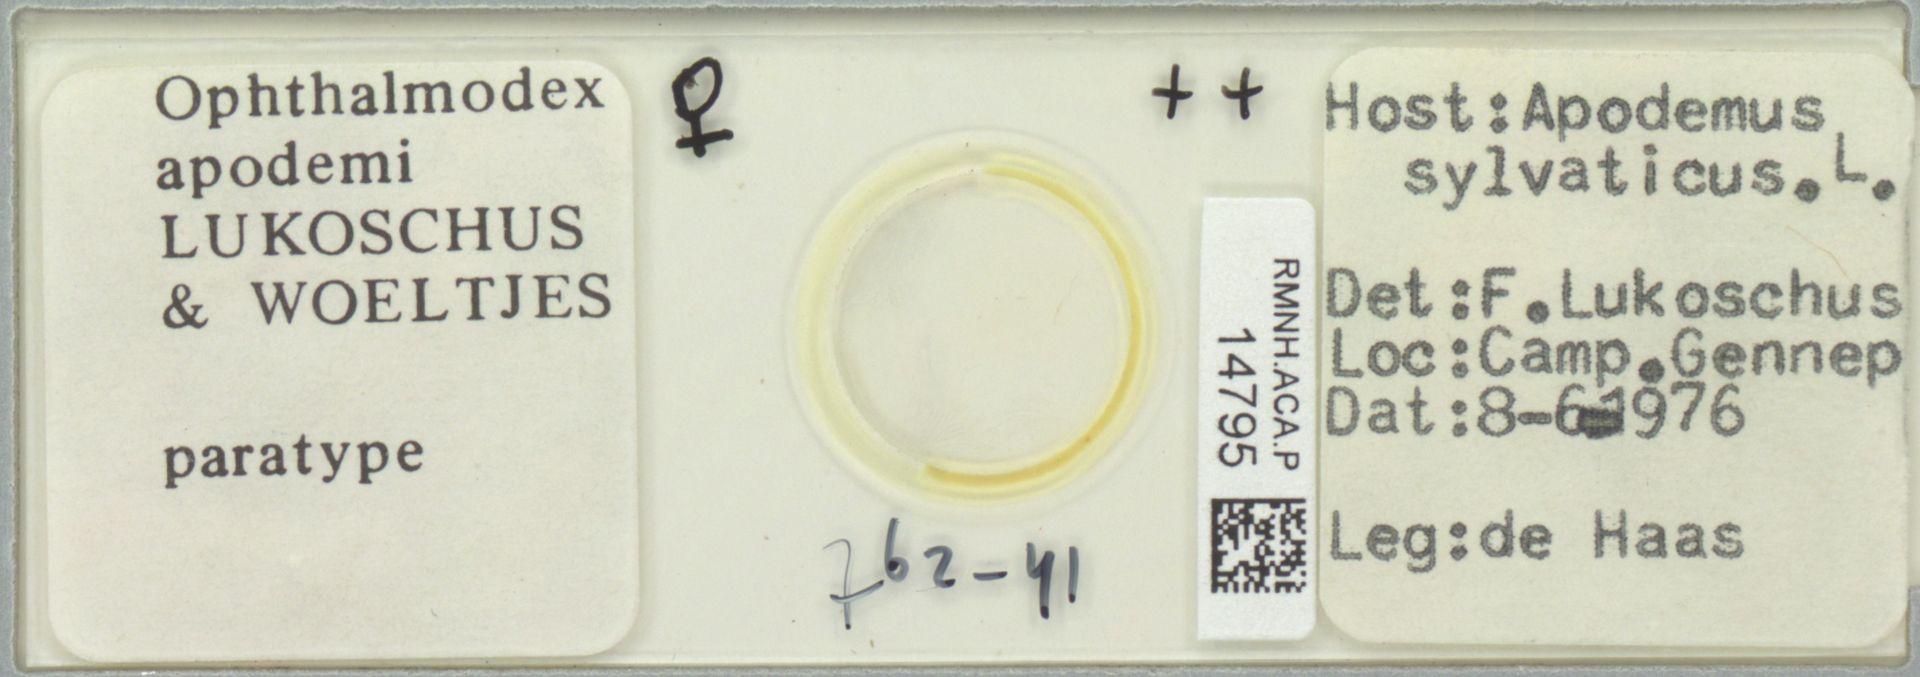 RMNH.ACA.P.14795 | Ophthalmodex apodemi